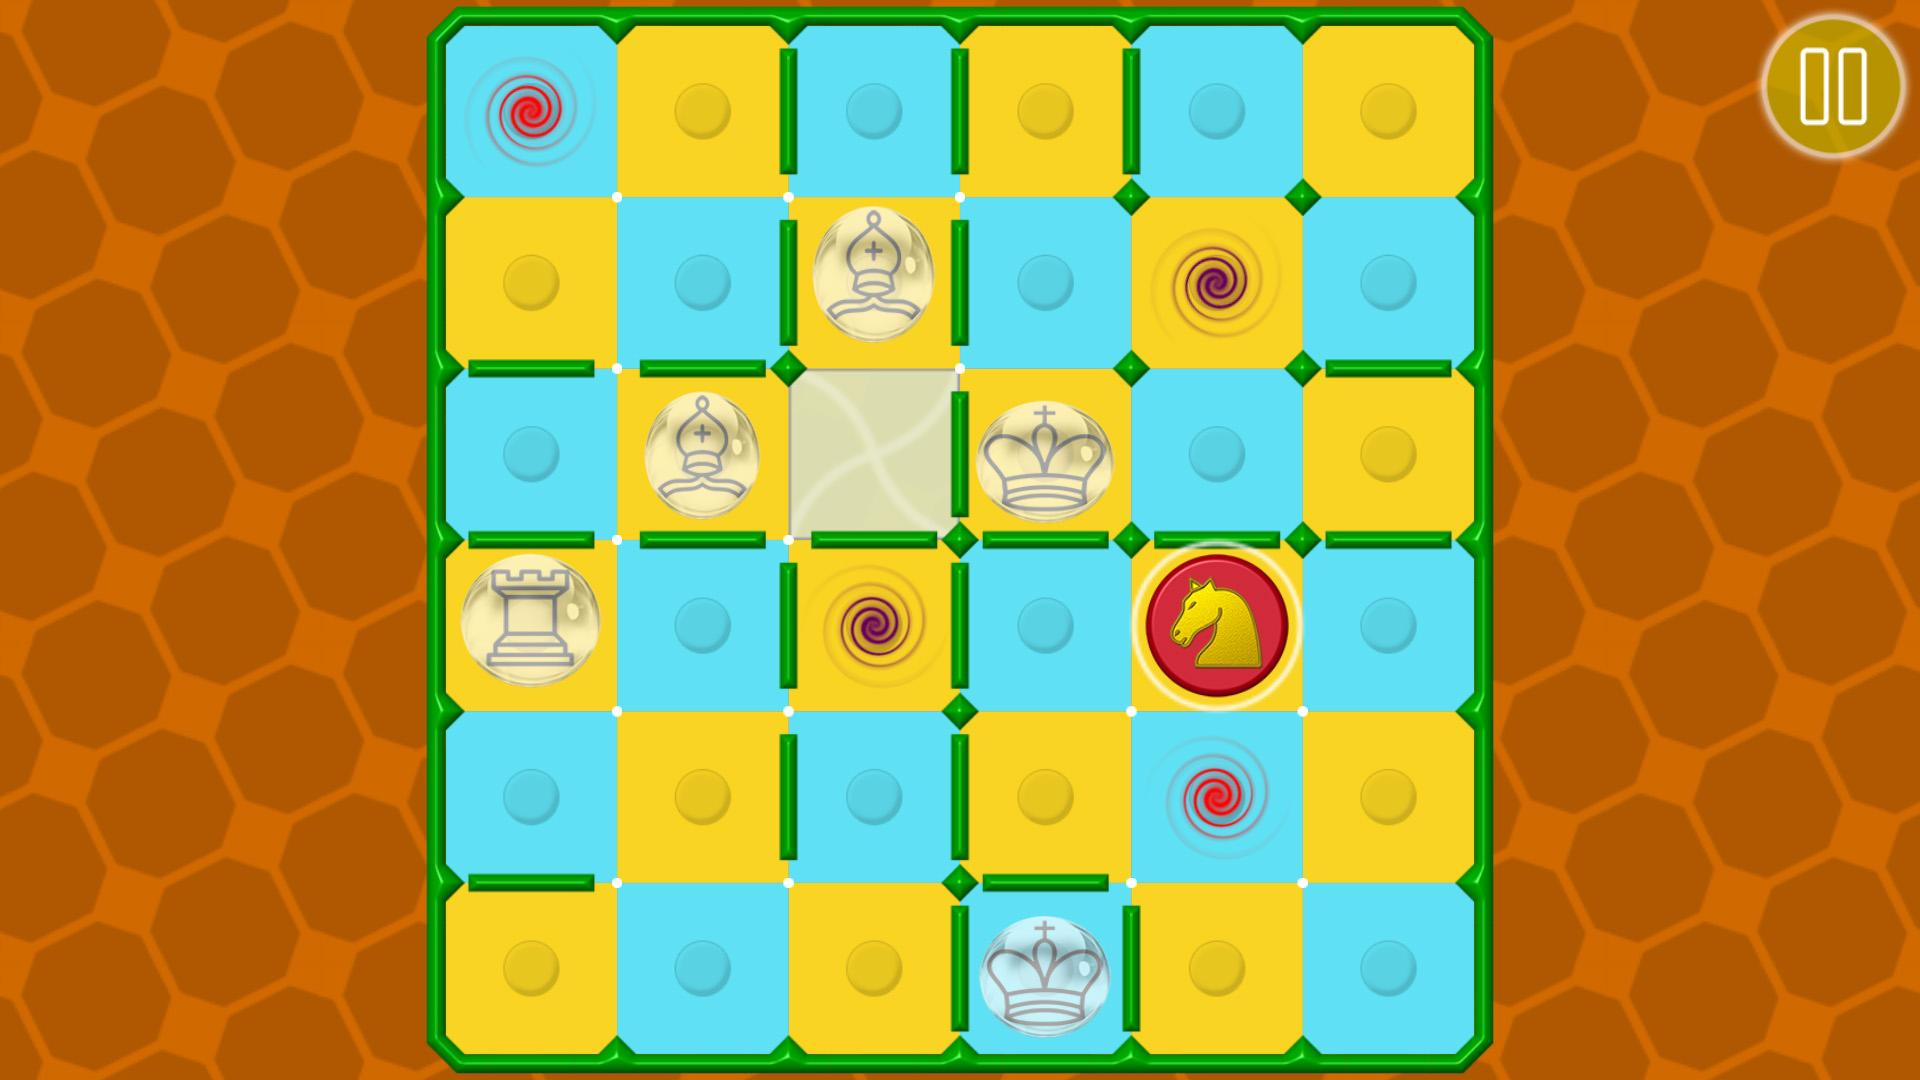 http://onpixelgames.com/wp-content/uploads/2017/09/Stage-2-11.jpg